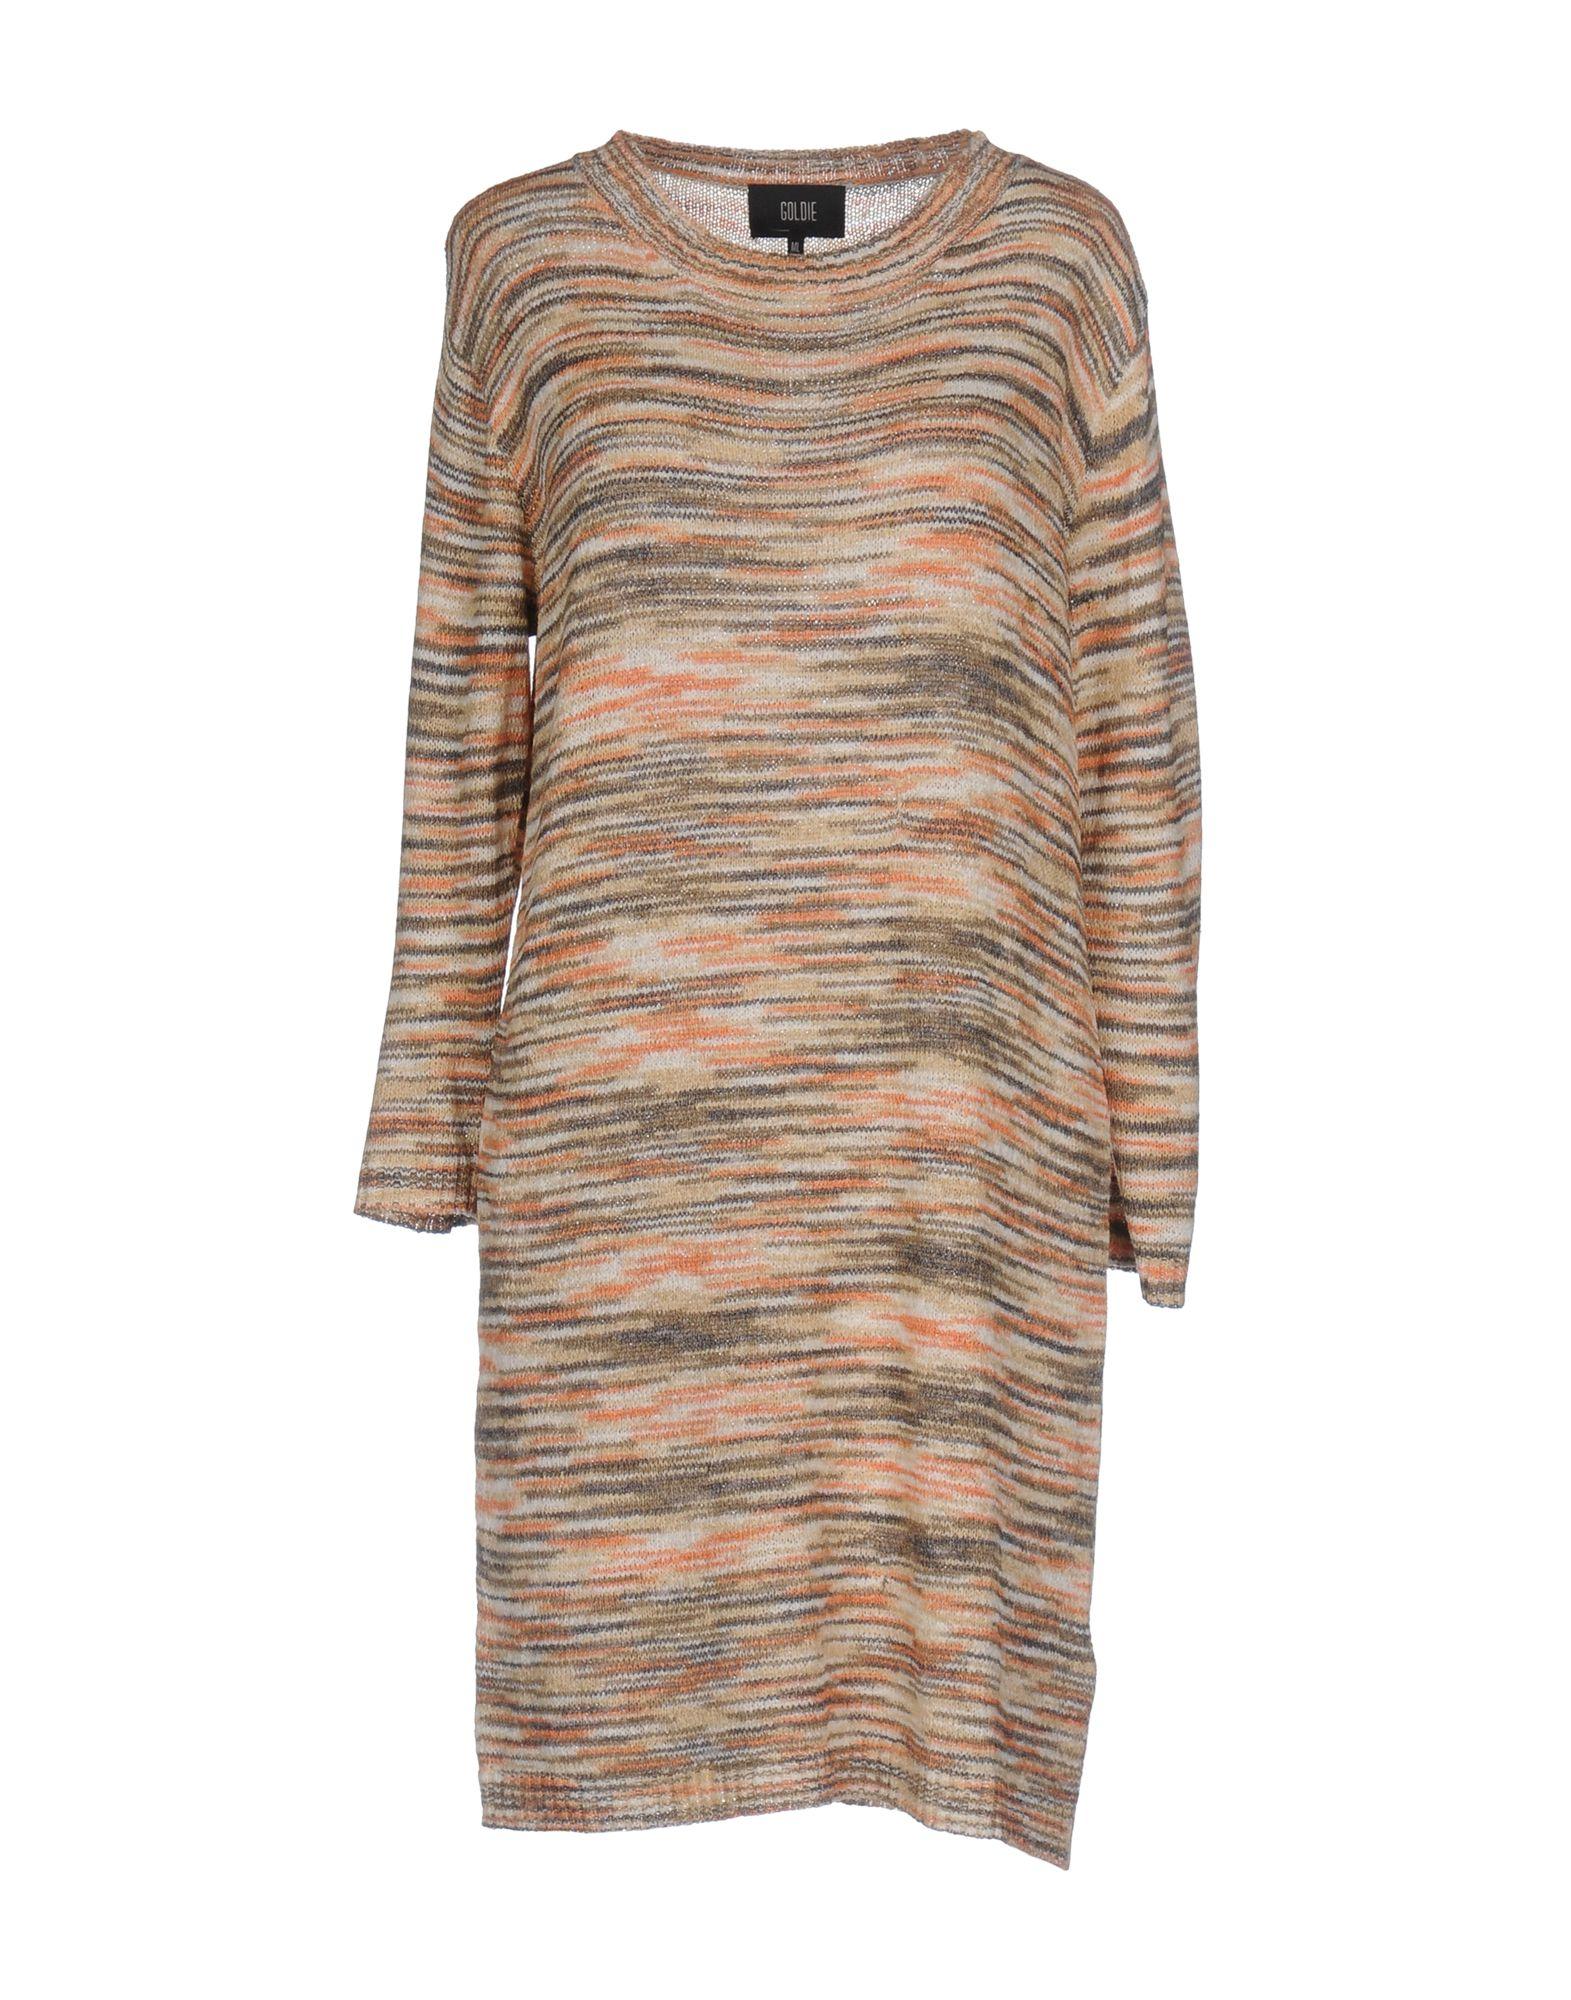 GOLDIE LONDON ΦΟΡΕΜΑΤΑ Κοντό φόρεμα